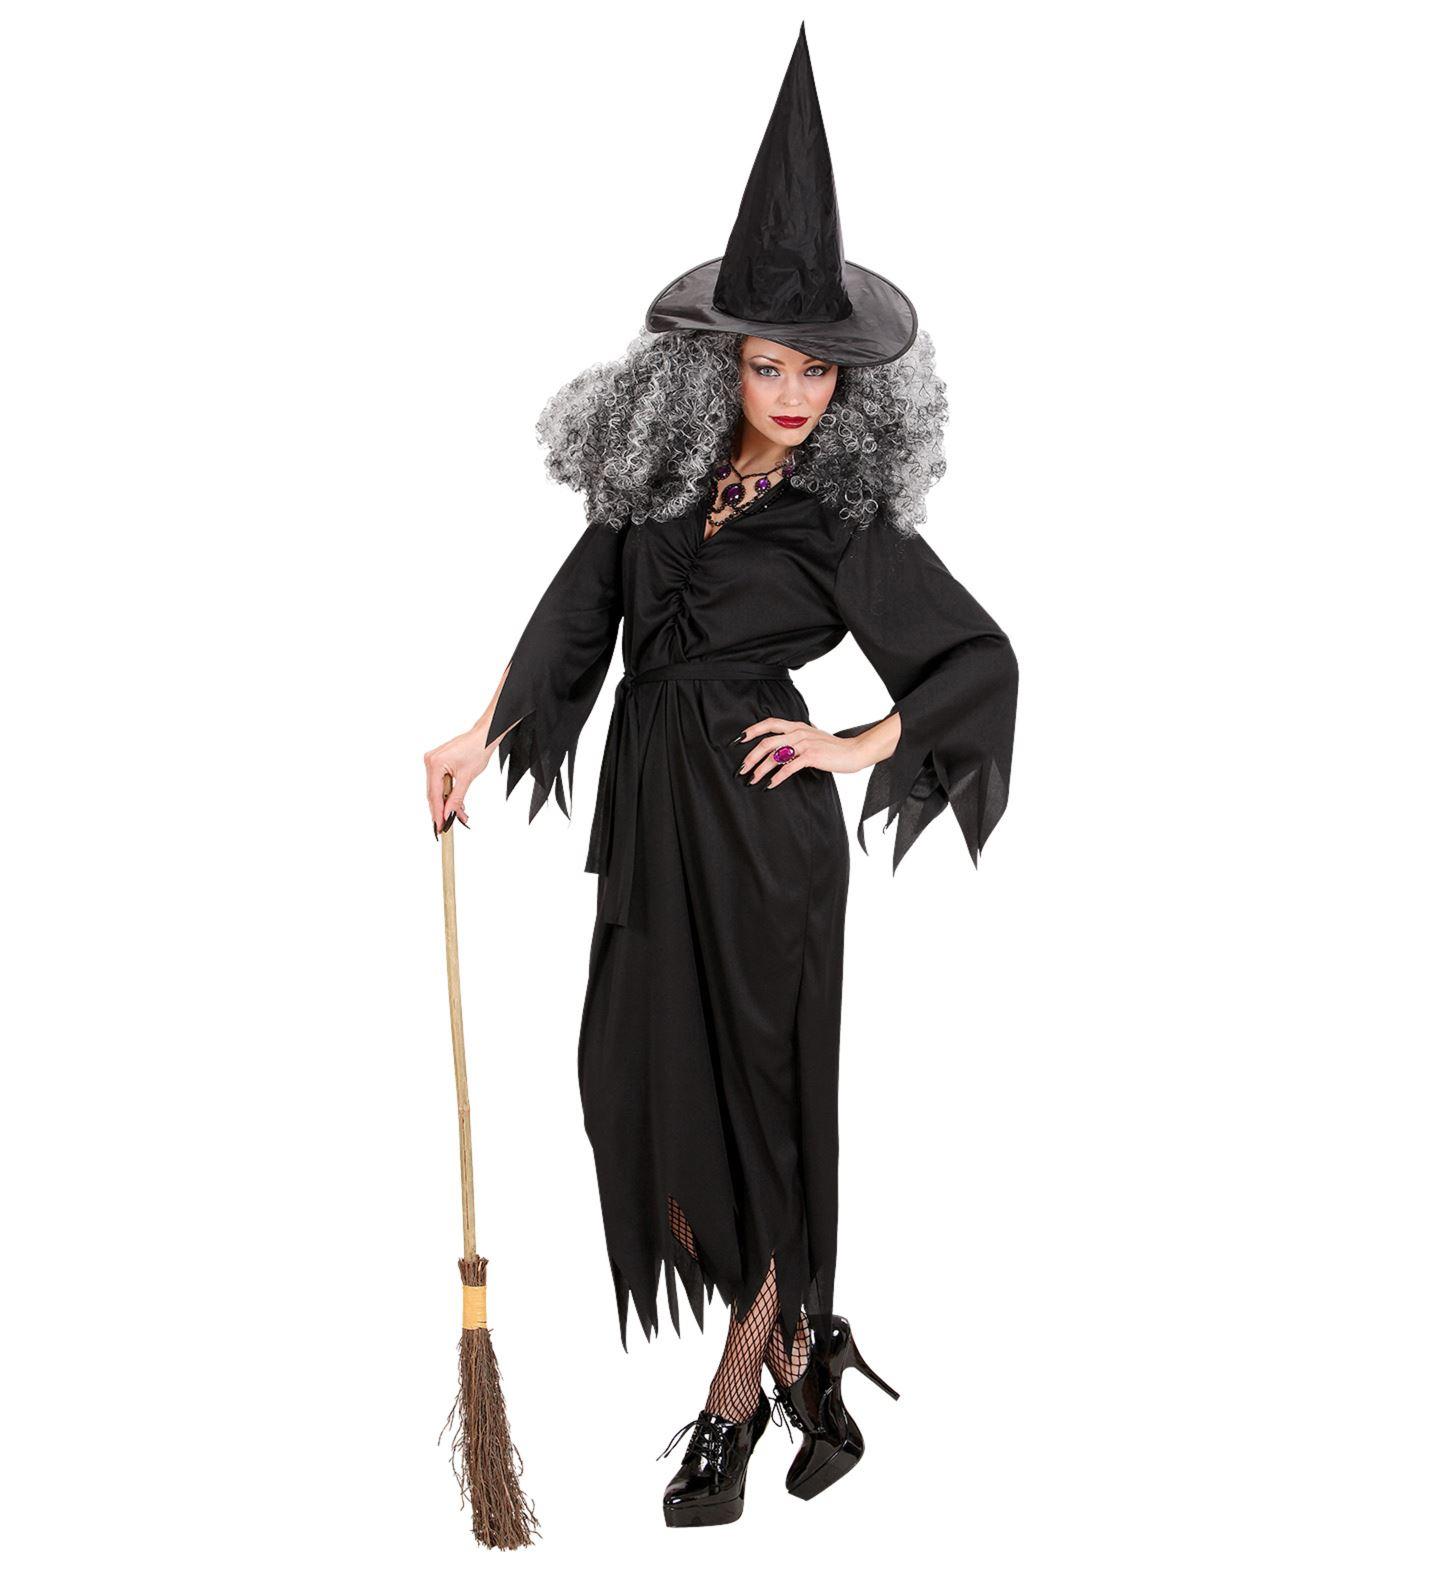 Hexen Kostüm, Gürtel+ Hut, Hexenkleid Damen schwarz S, M , L